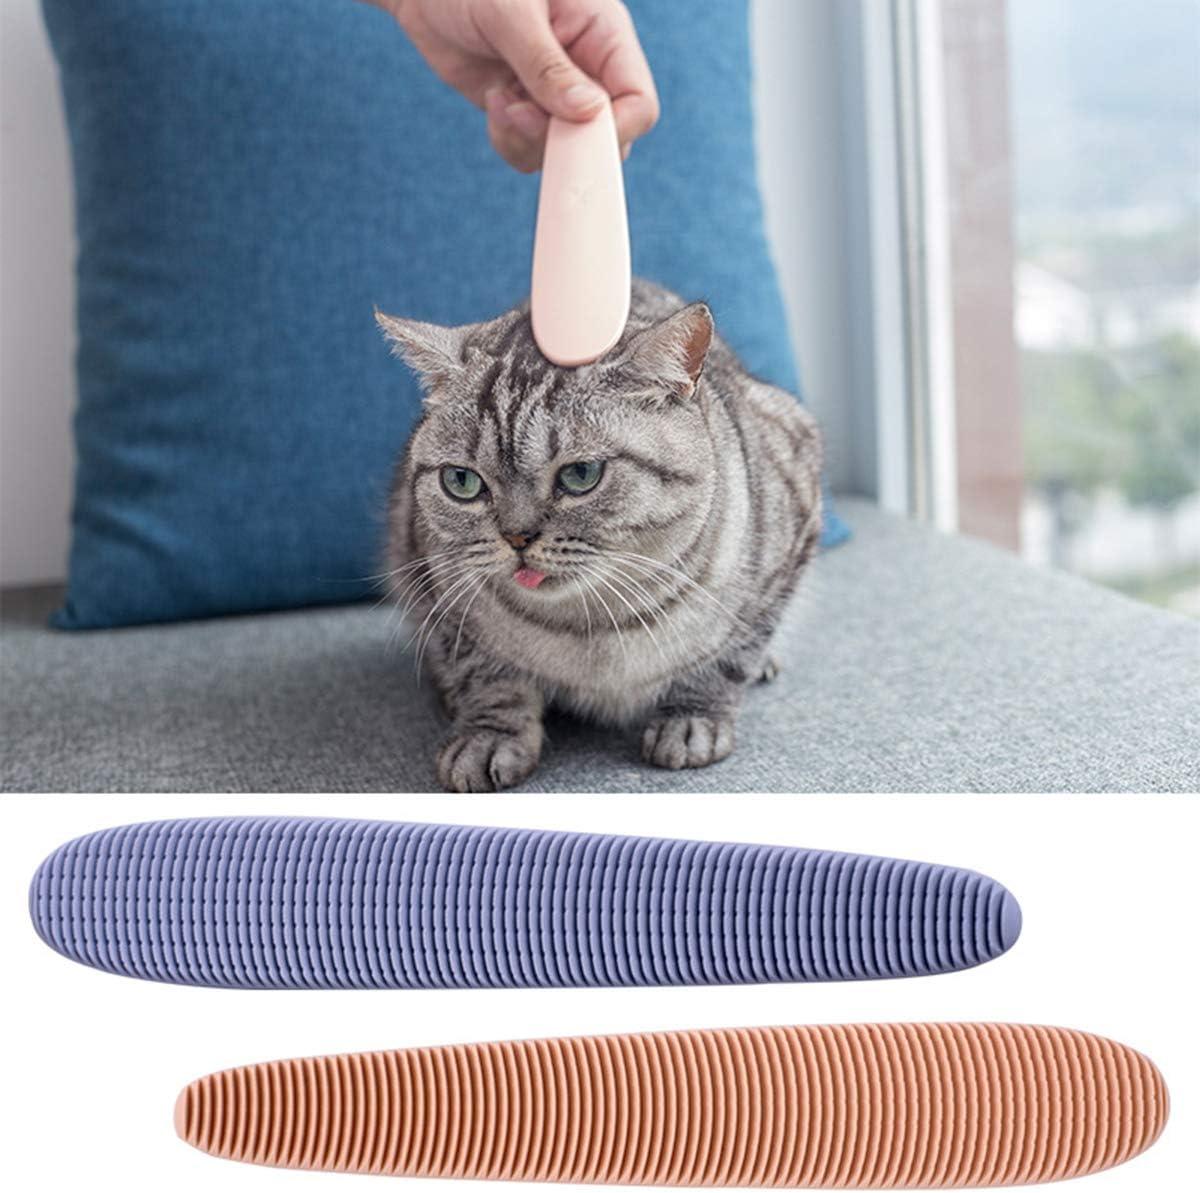 Ruiqas Peine de Pelo de Gato Mascota Peine de Masaje de Lengua de Gato Herramienta de Cuidado Diario Port/átil para Gato Gatito Gris